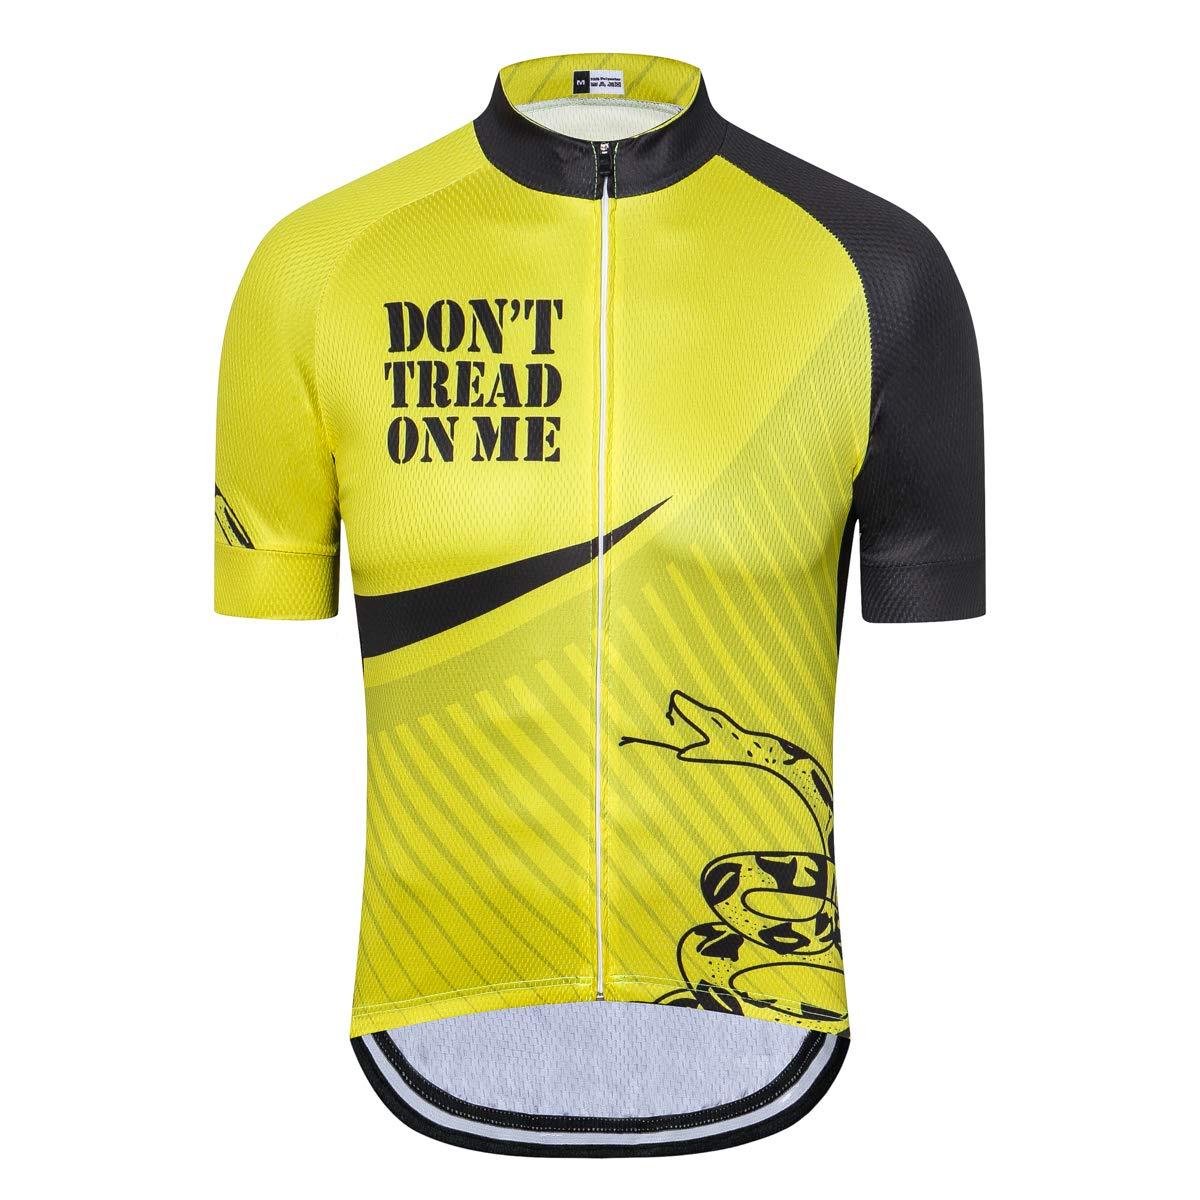 Cycling Jersey Short Sleeve USA Style Bike Tops with Pocket Reflective Stripe